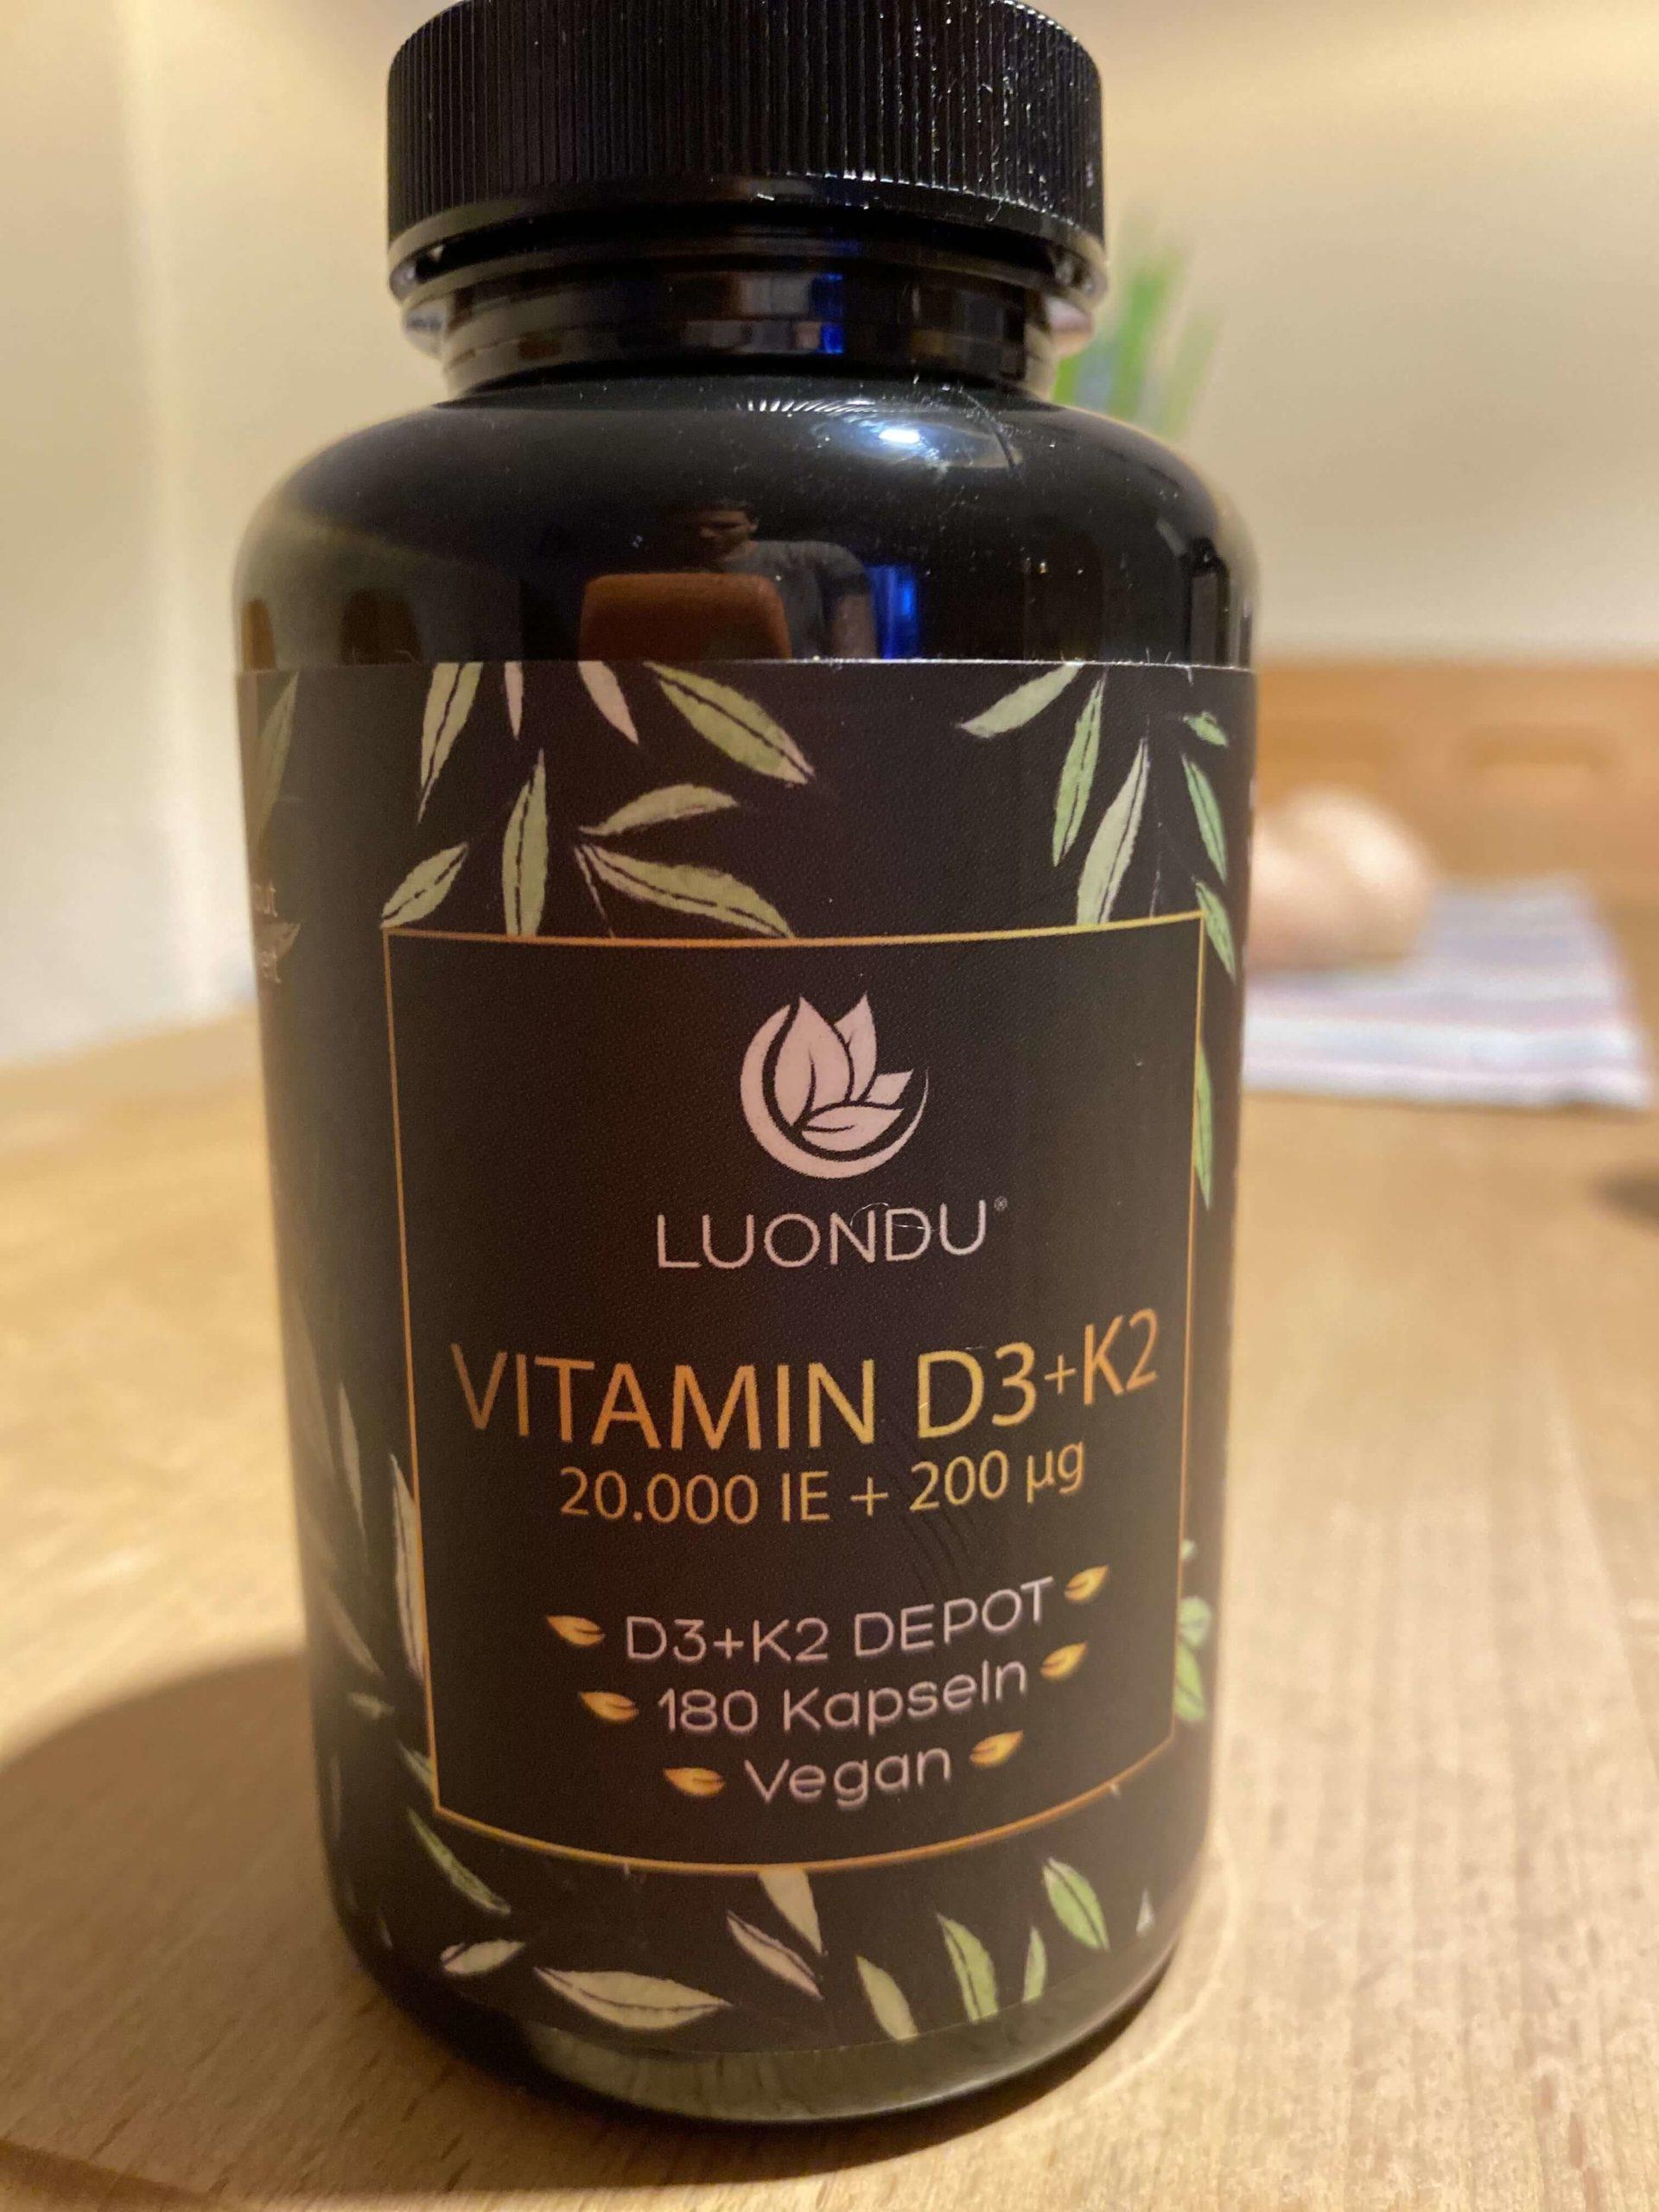 Luondu Vitamin D3